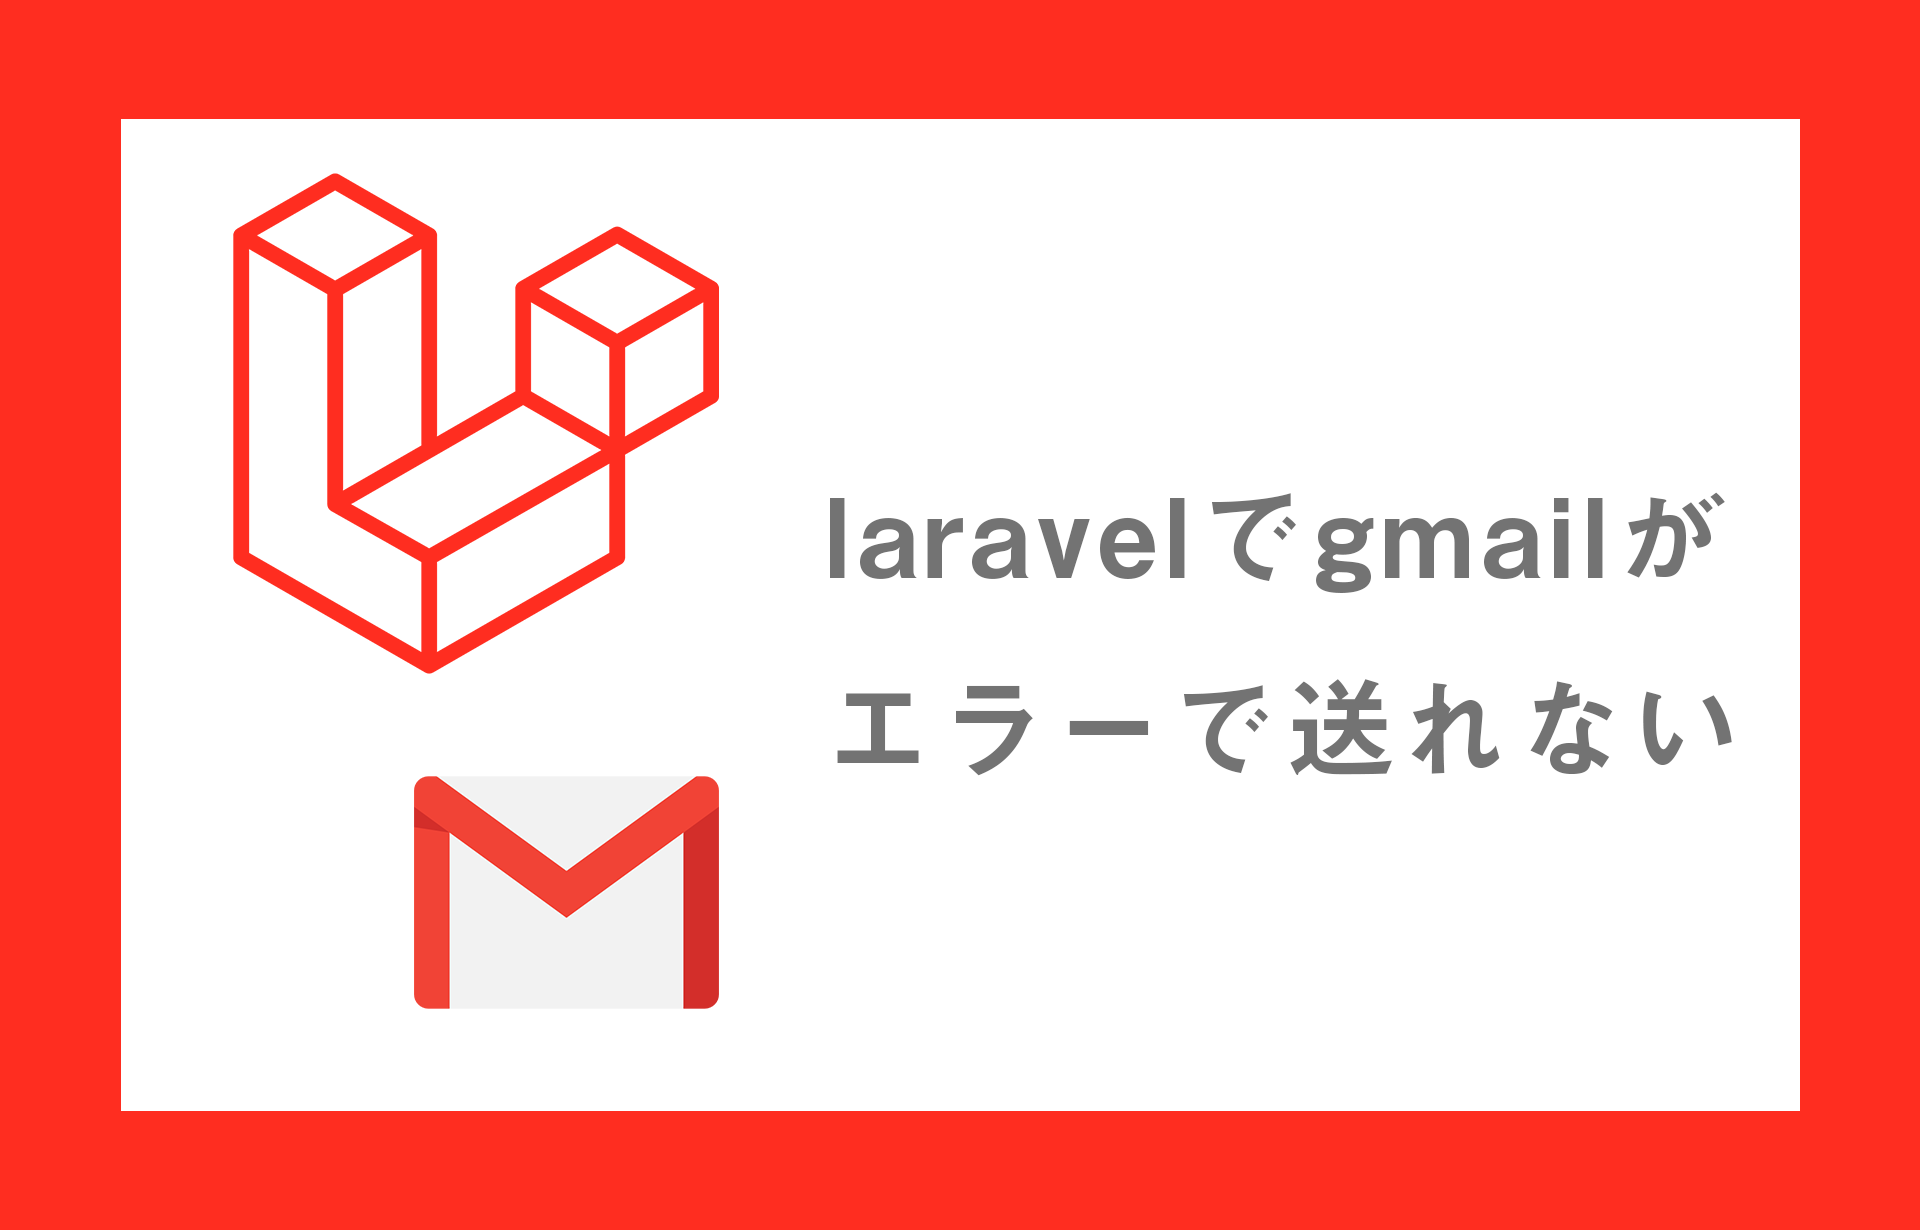 laravel_gmail